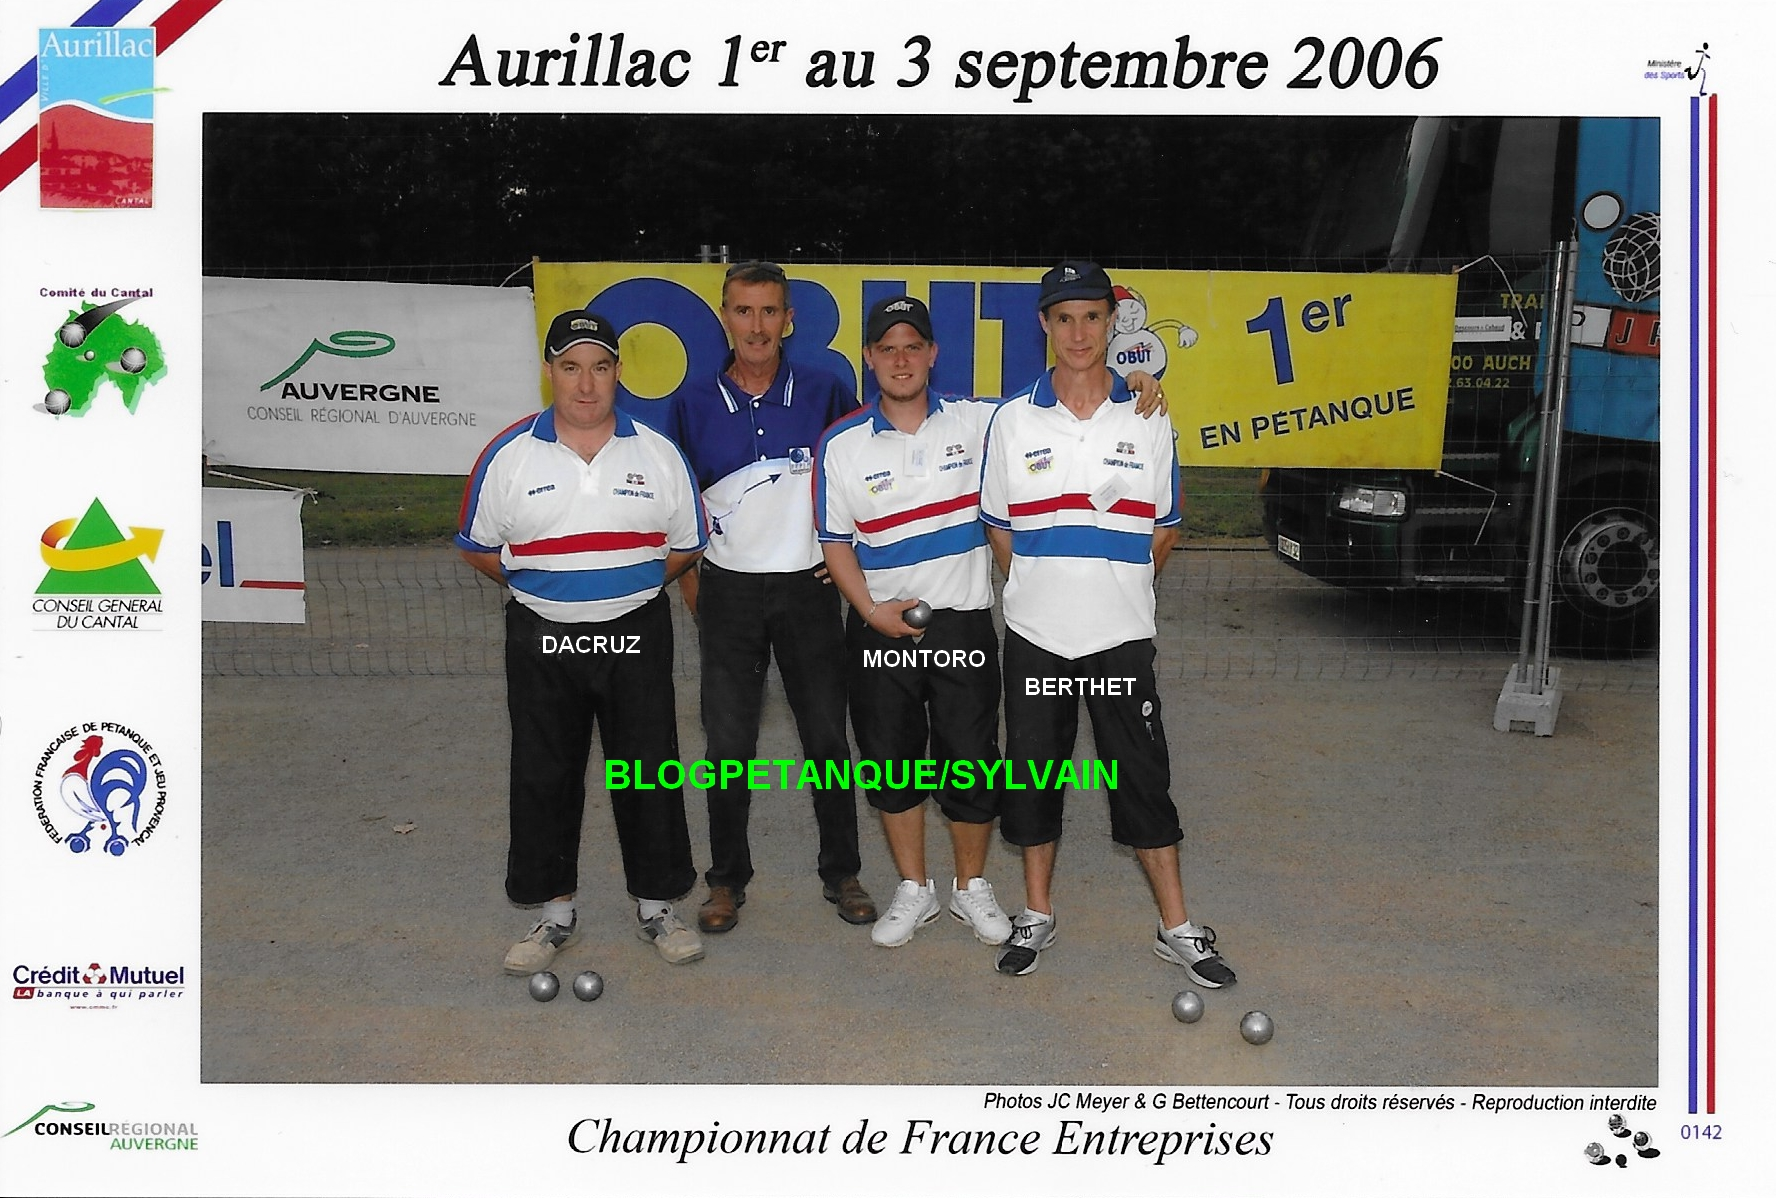 Les champions de ligue cadets du 06